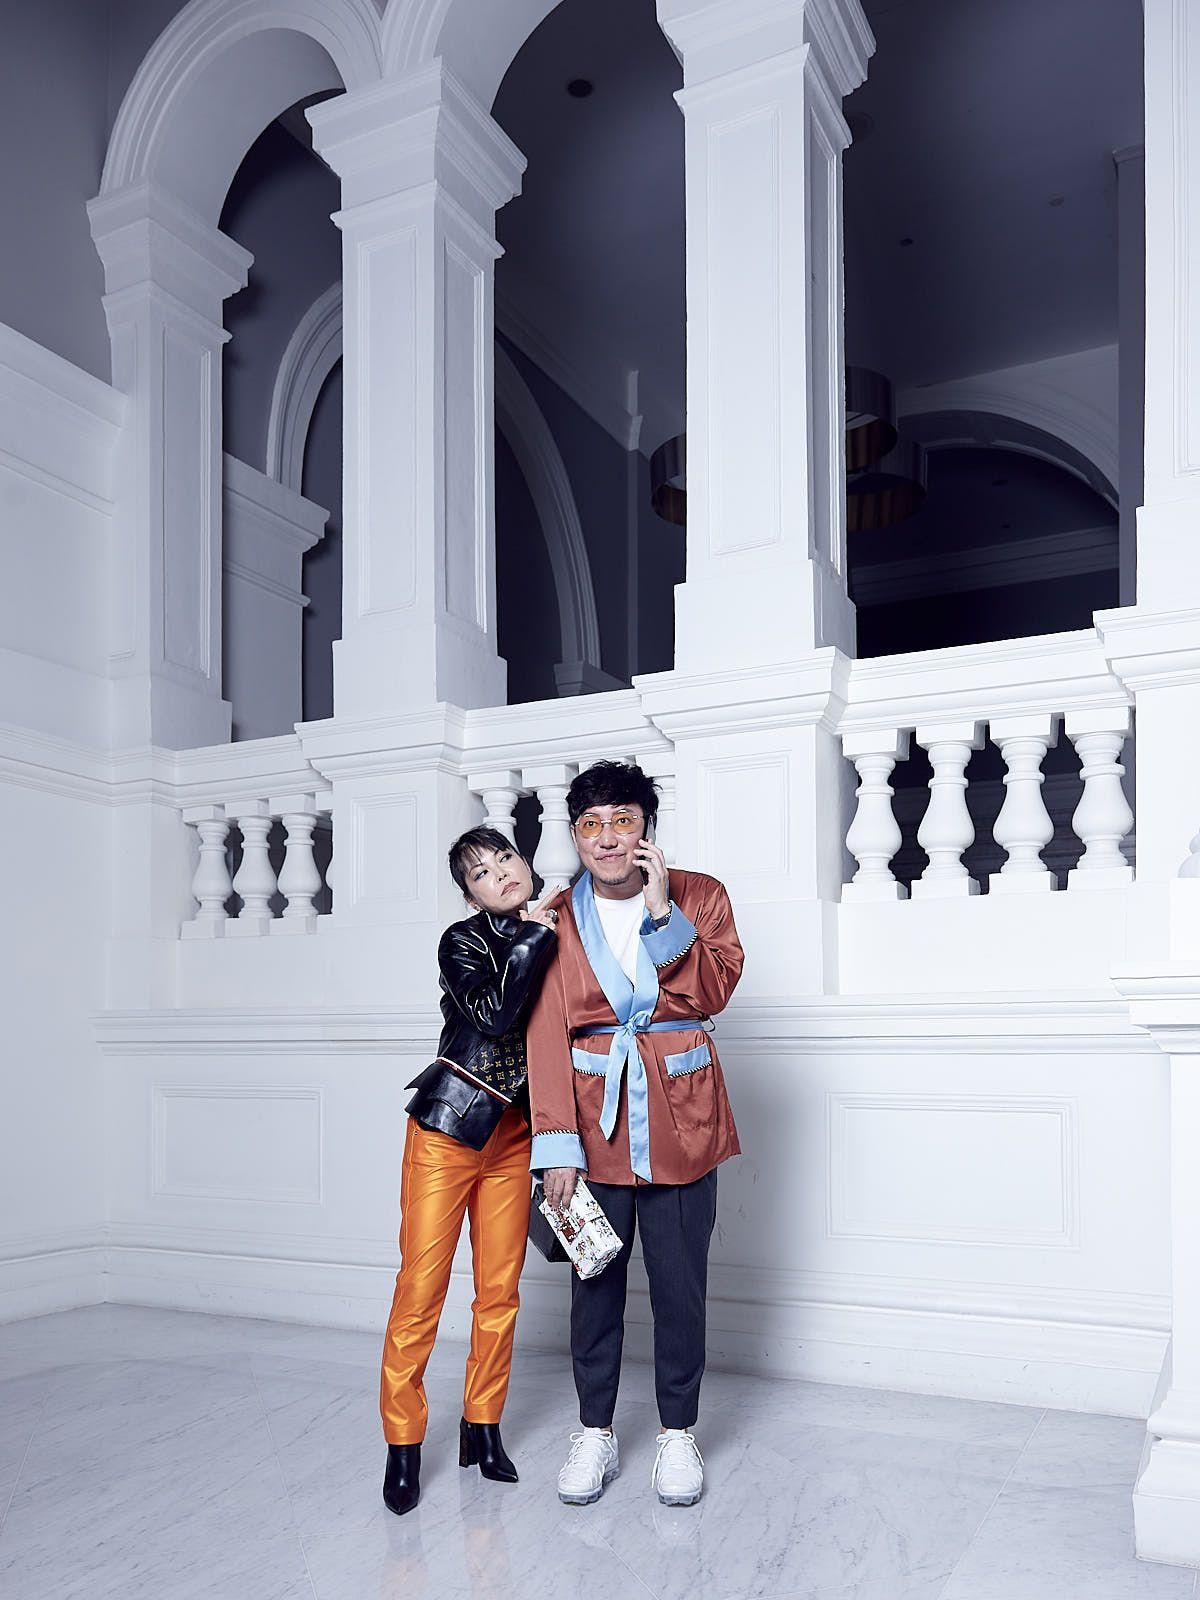 Kyoko Abe in Louis Vuitton, Desmond Lim in Christian Dada